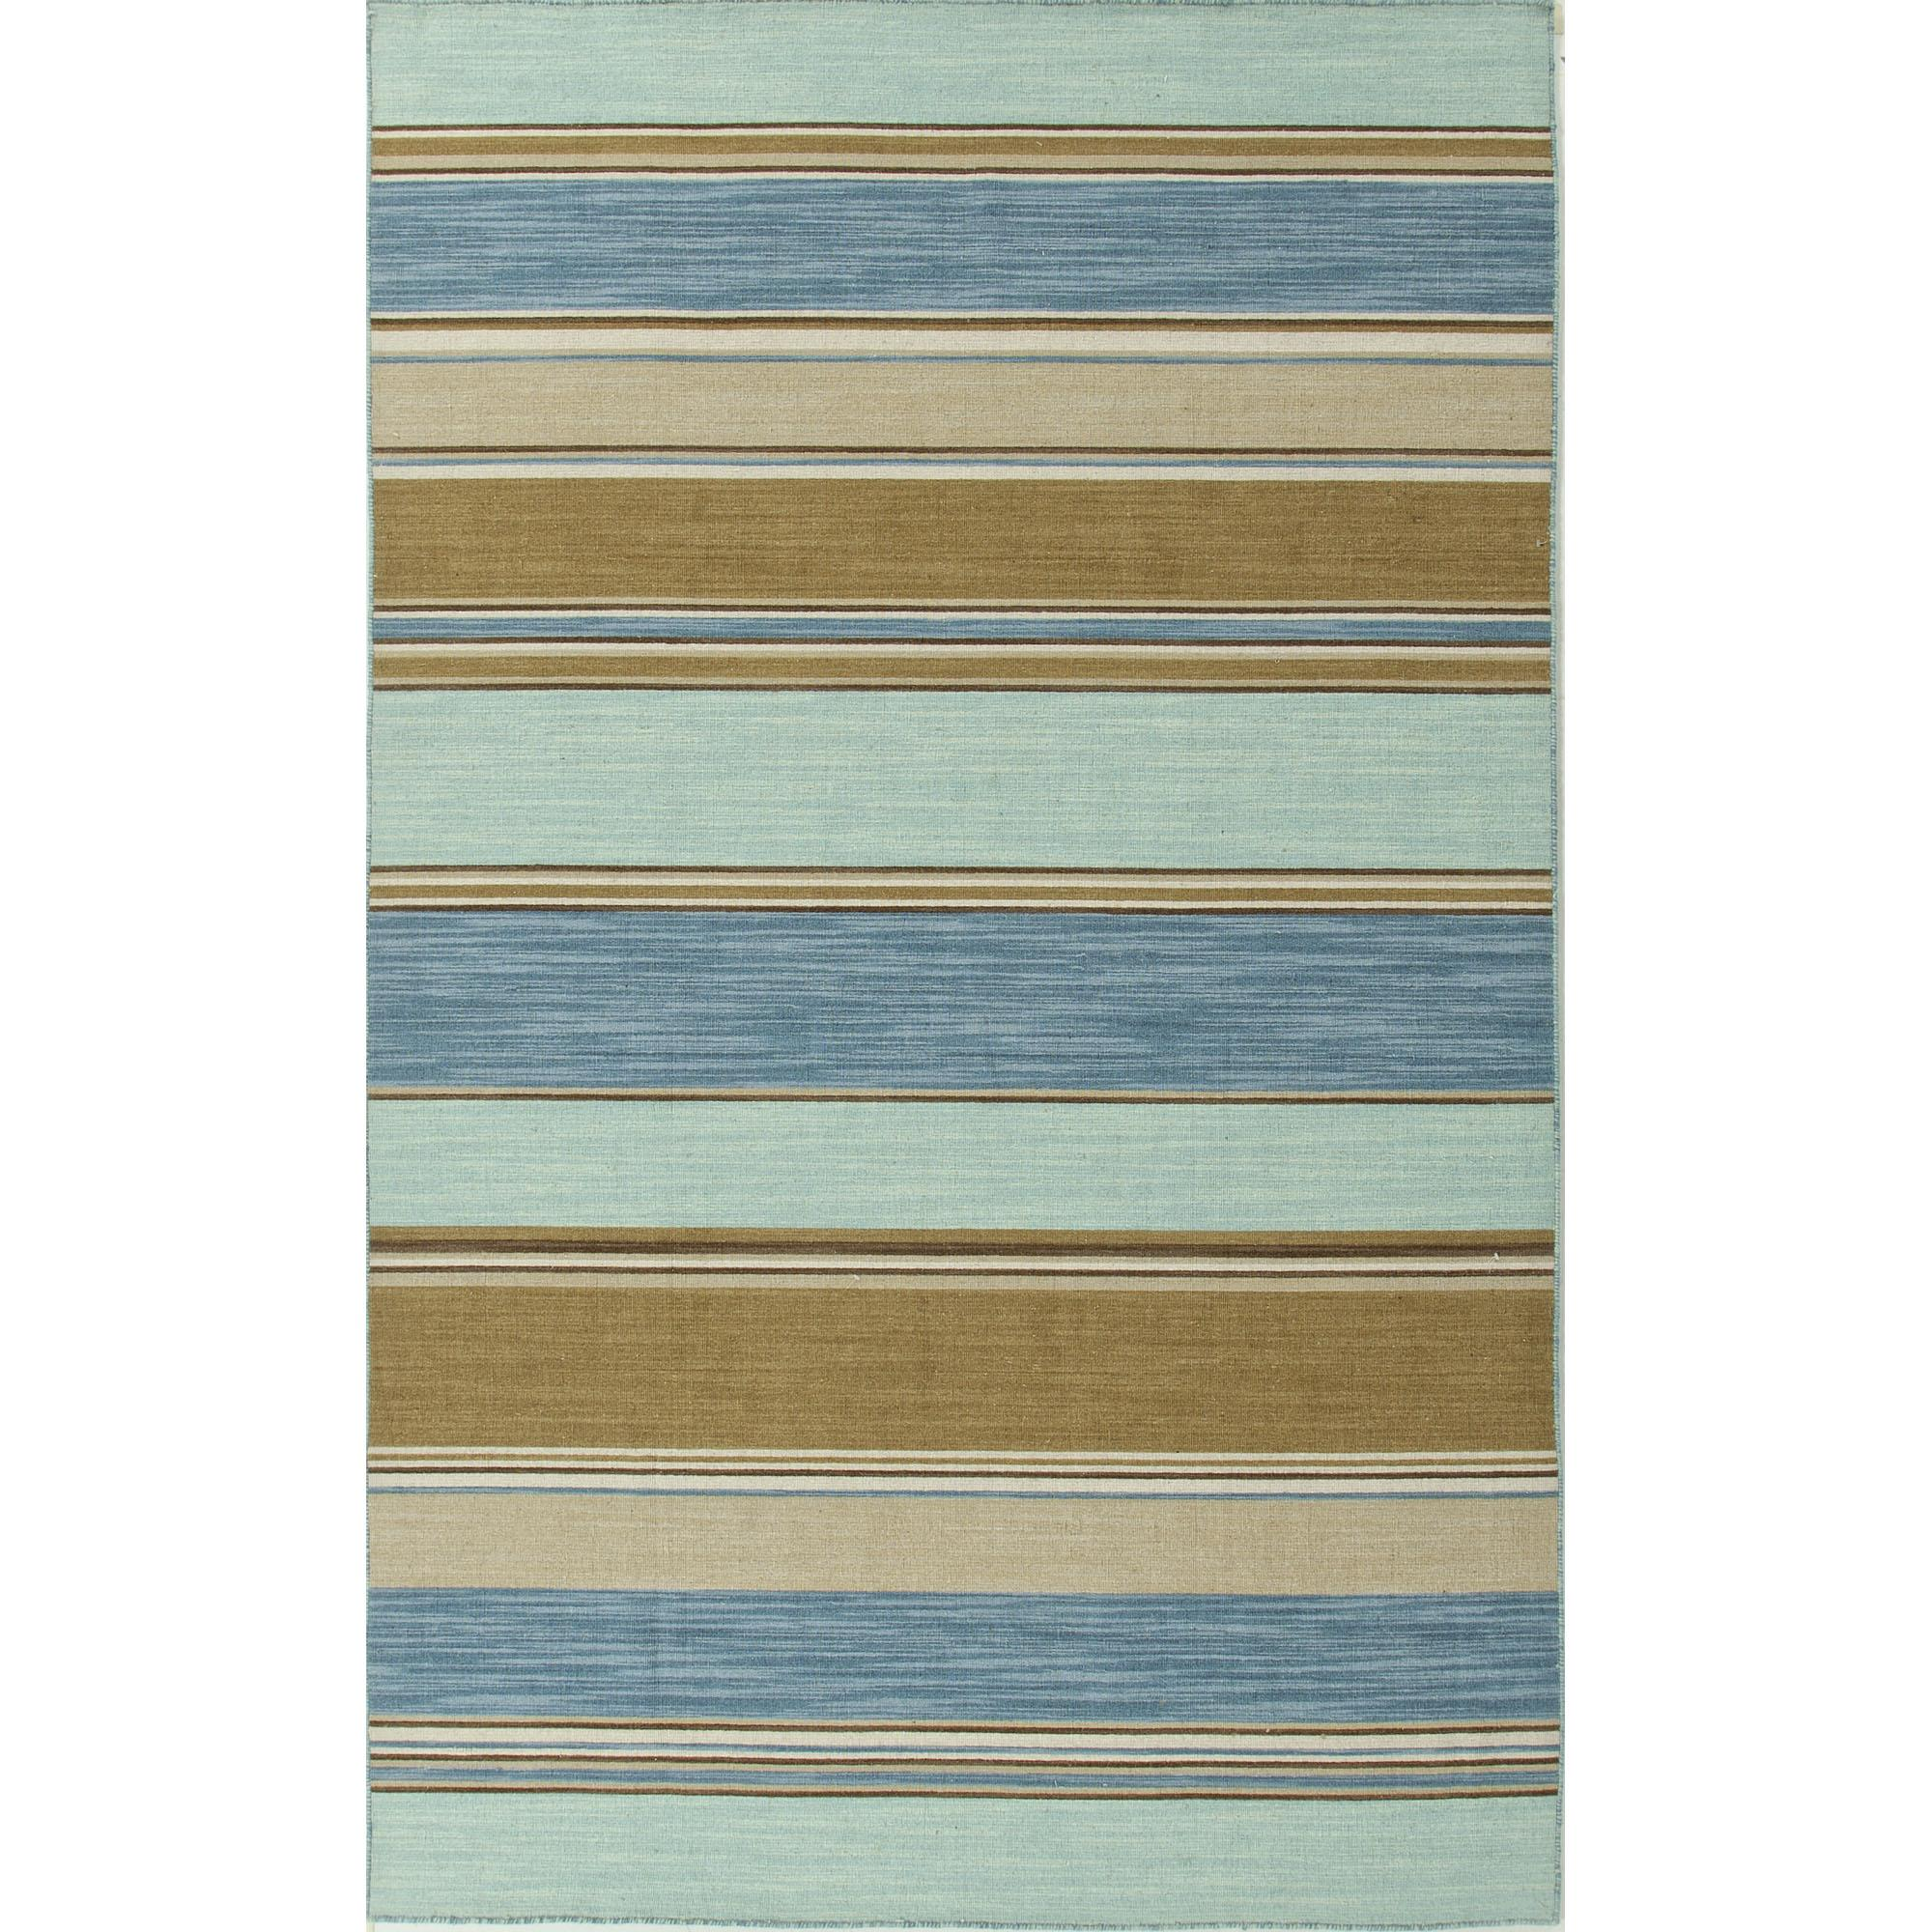 JAIPUR Rugs Coastal Shores 5 x 8 Rug - Item Number: RUG122774